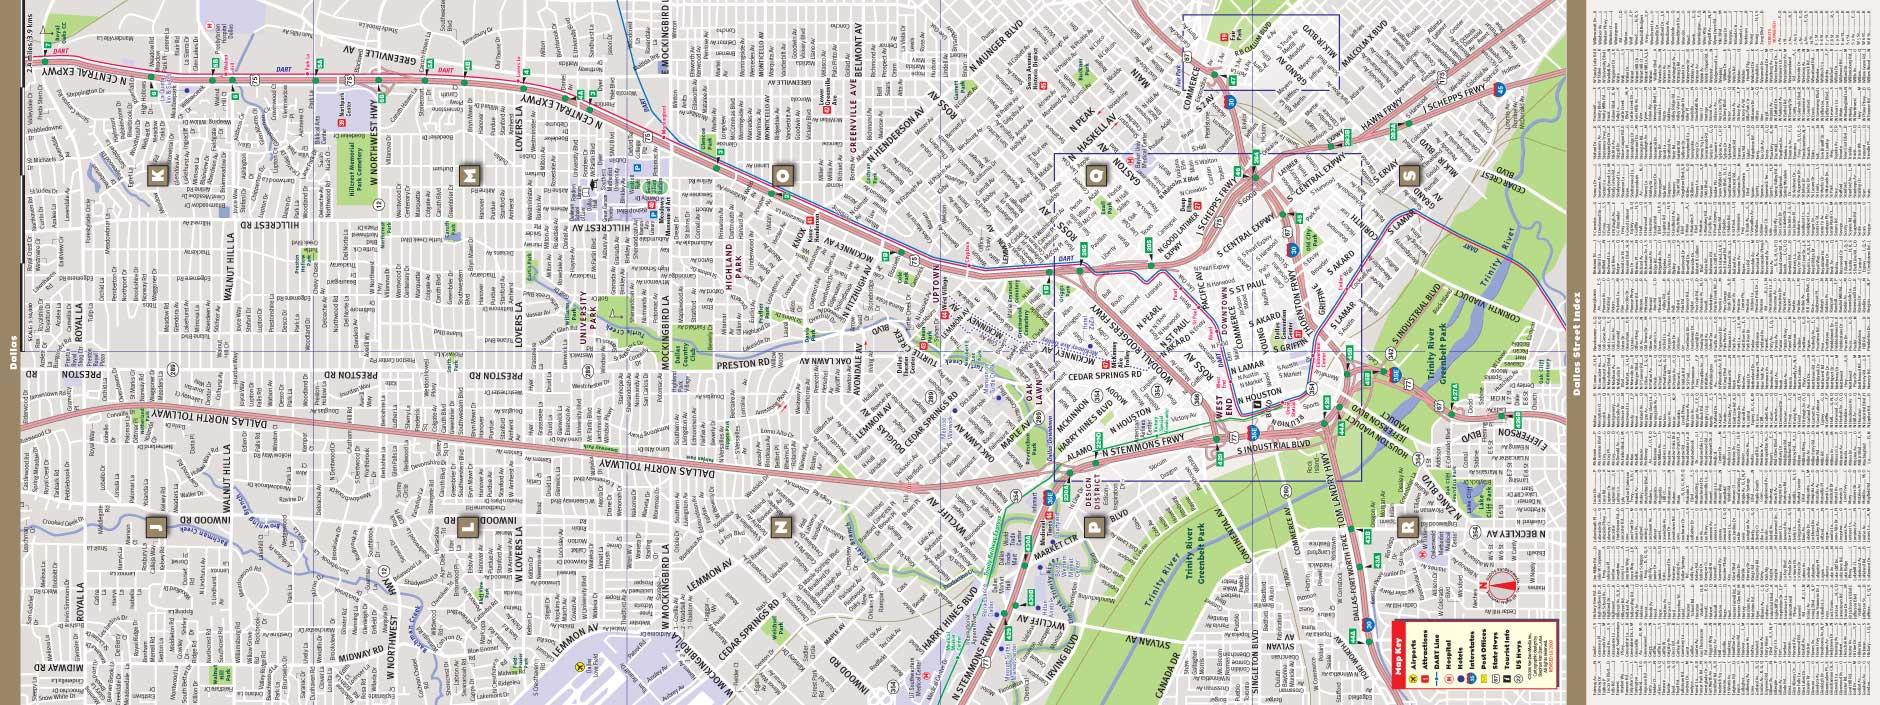 Dallas Map By VanDam Dallas StreetSmart Map City Street Maps - Nyc unfolds map